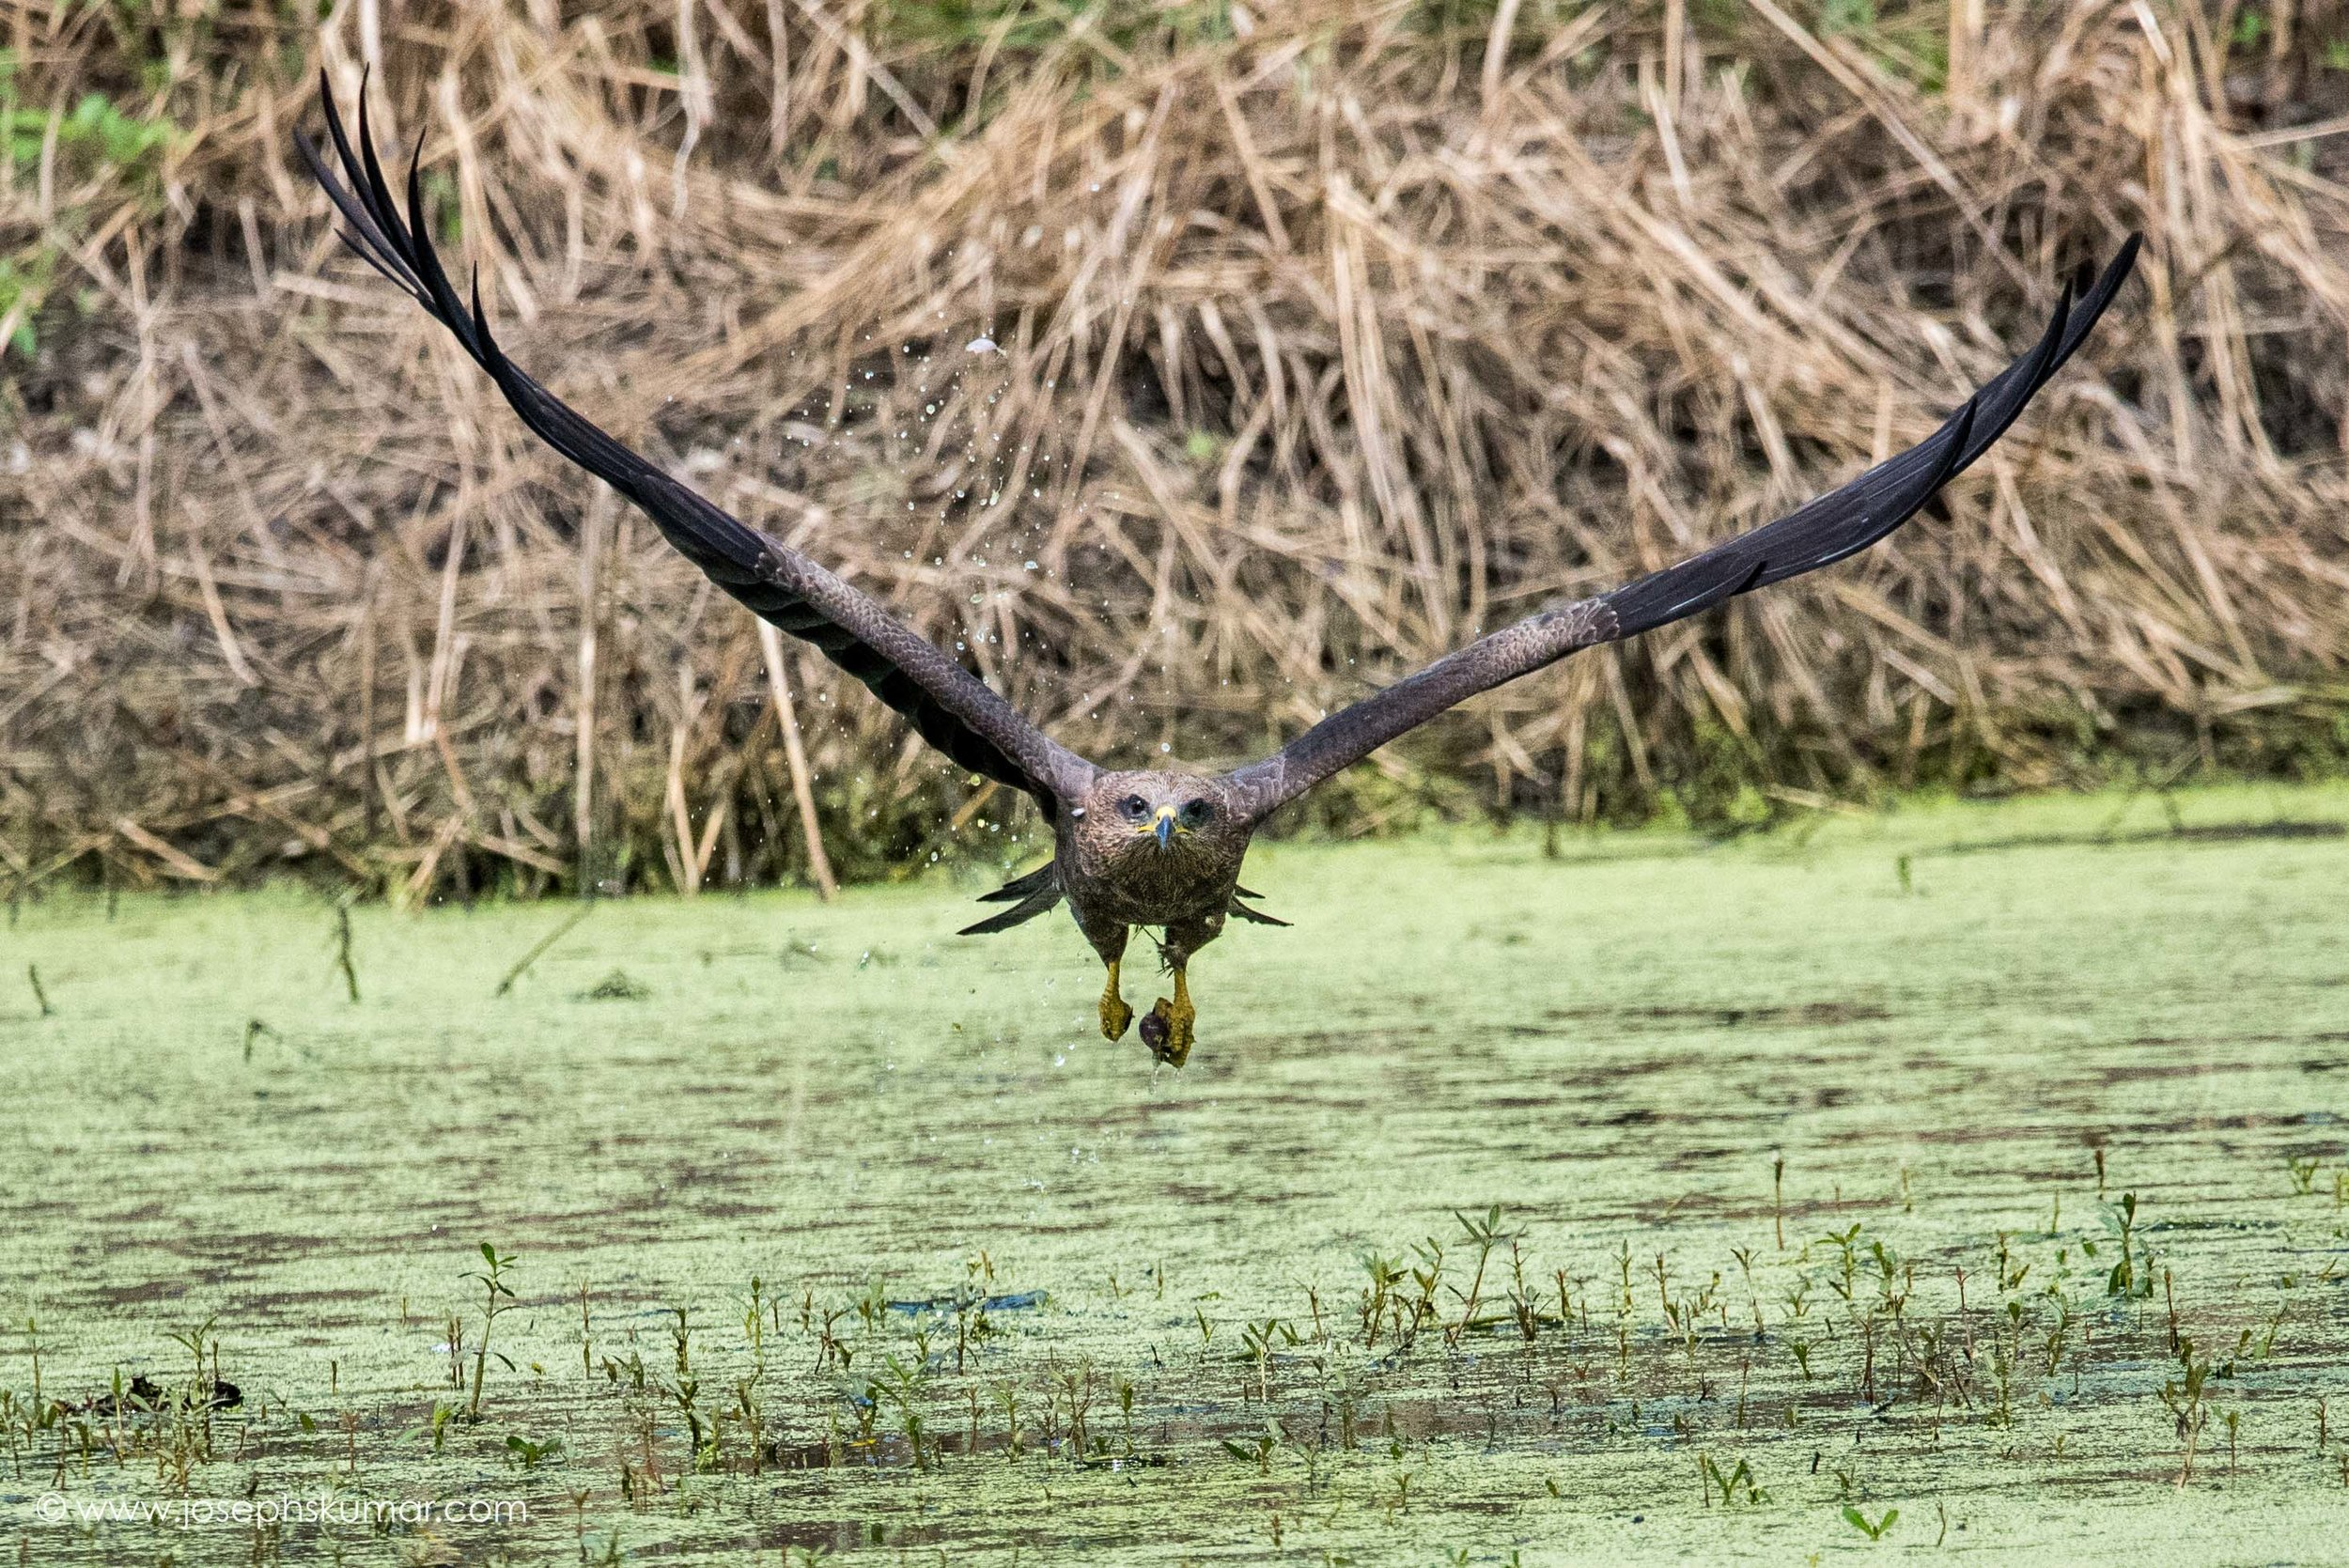 Black Kite going for the scoop.